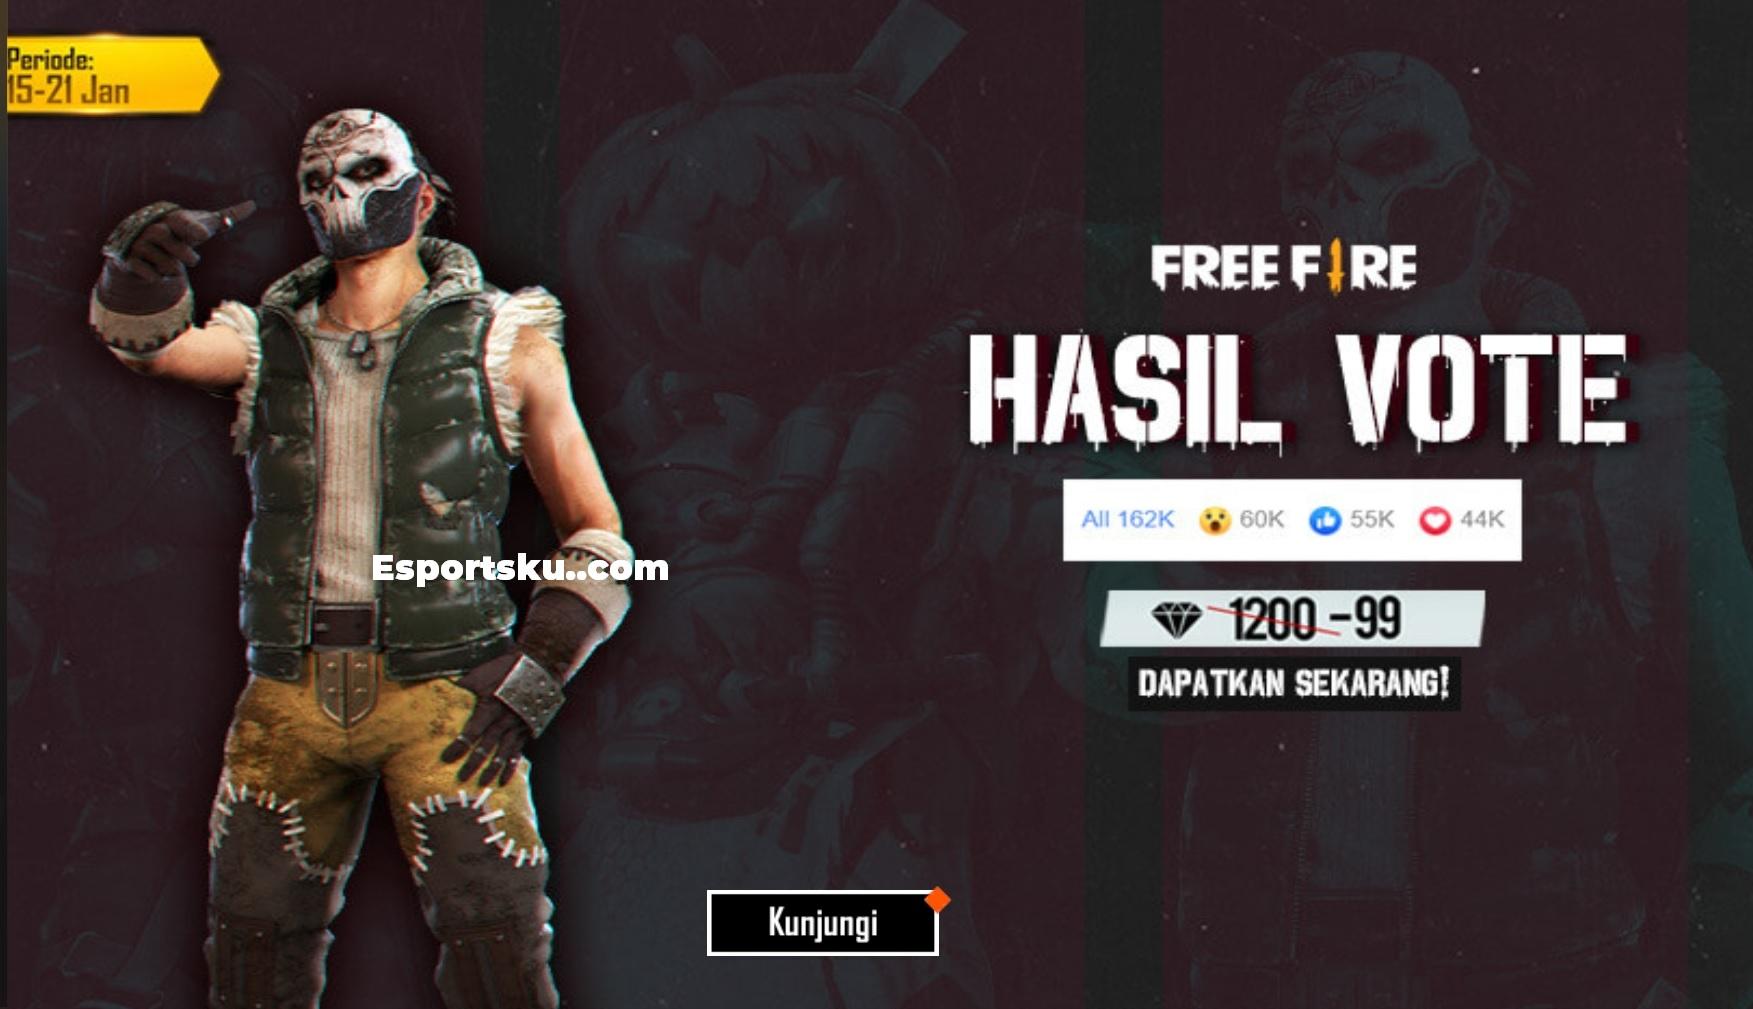 Bundle Skull King Ff Murah Hanya 99 Diamond Free Fire Esportsku